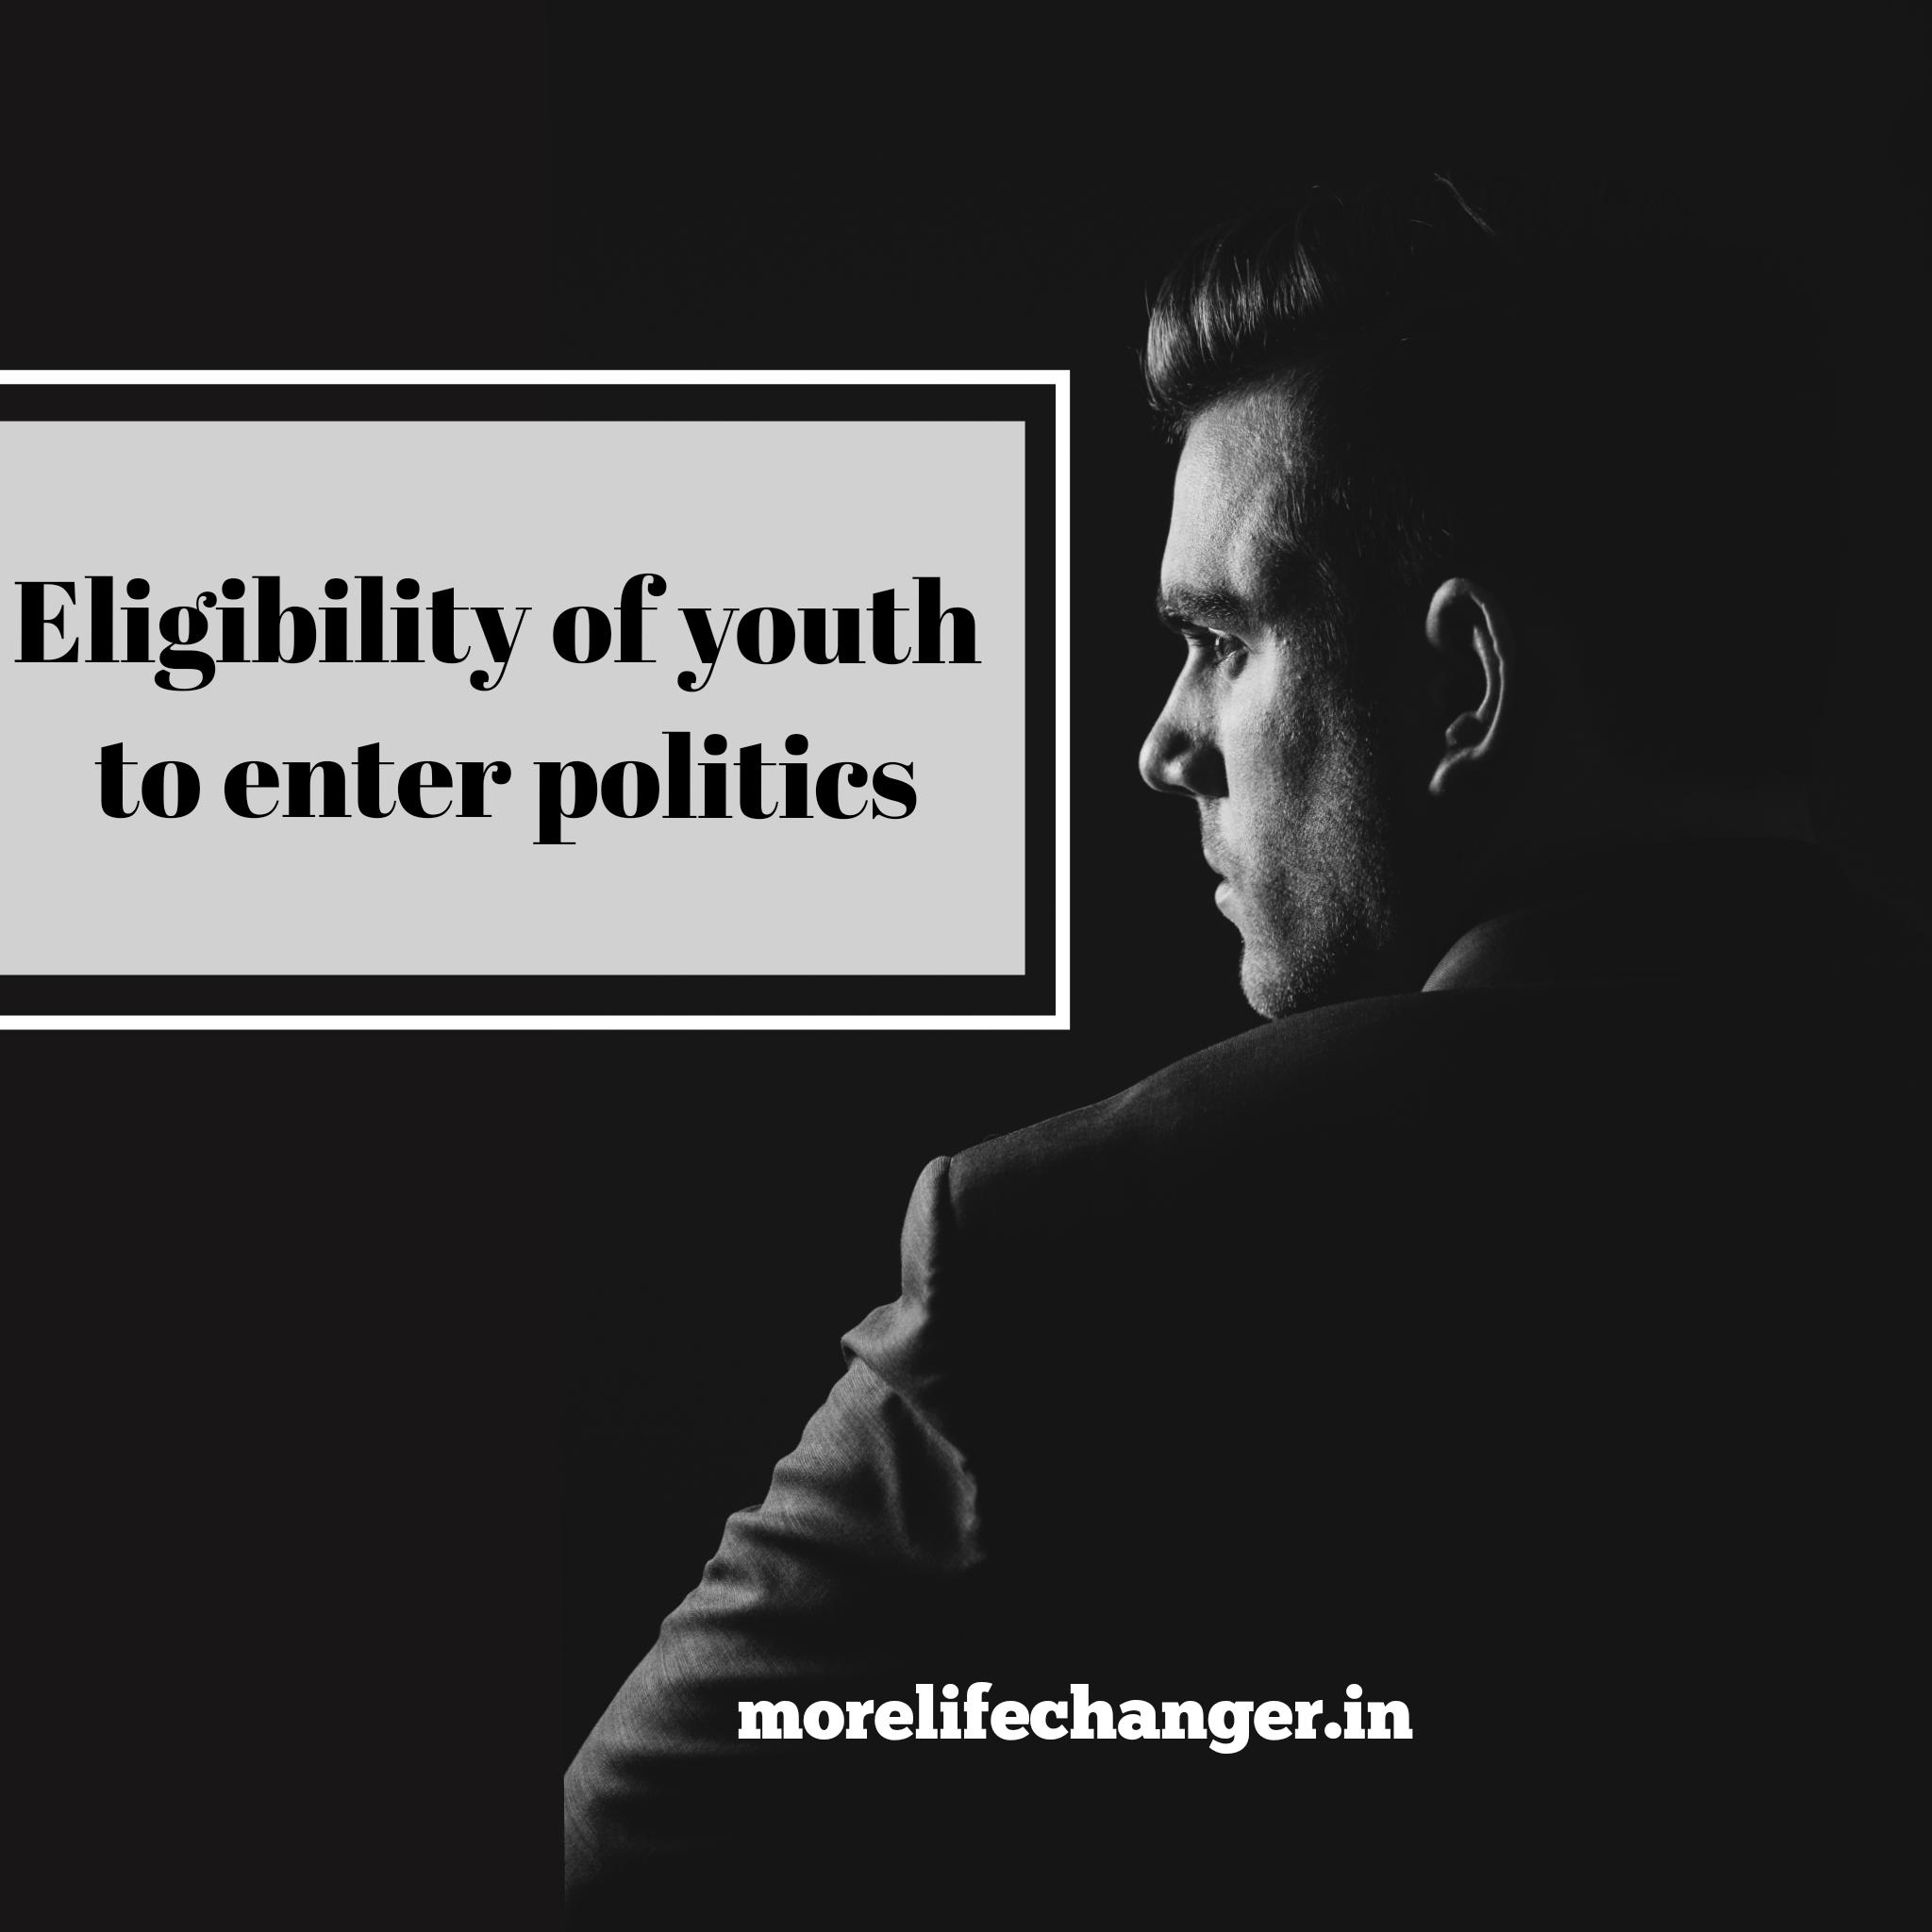 Eligibility of youth to enter politics